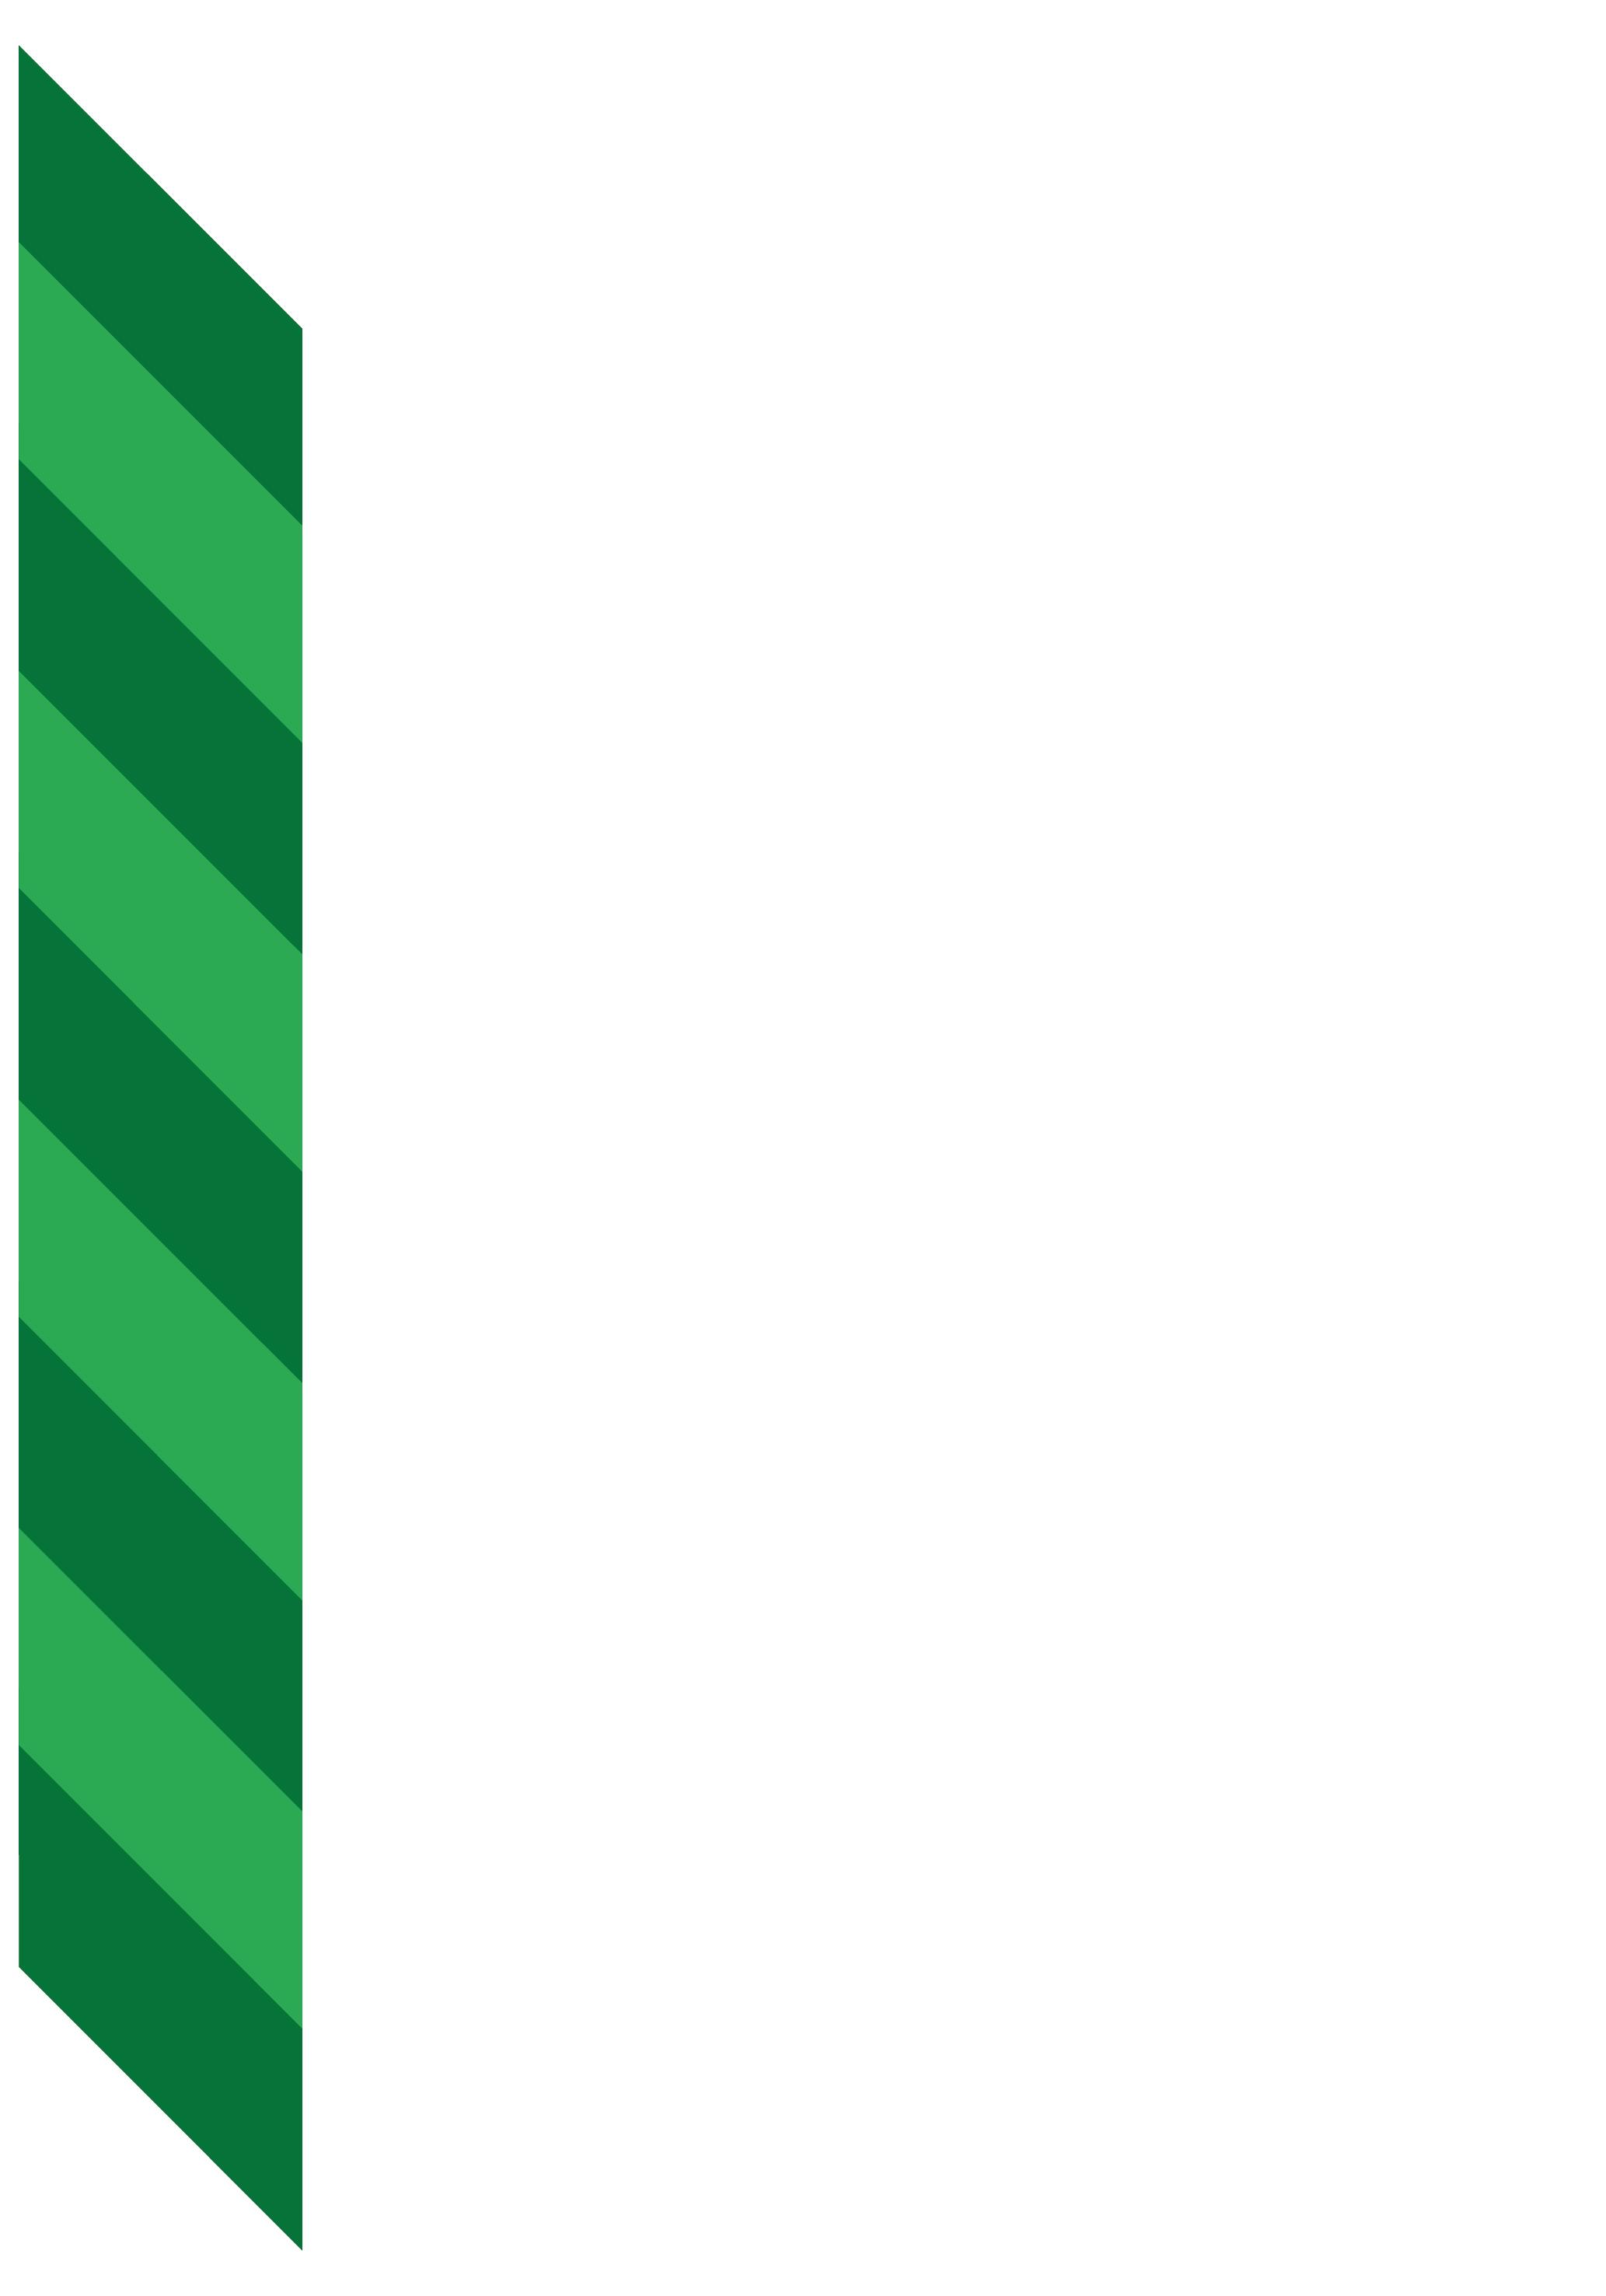 Landscape Gardeners Manchester The urban gardener manchester landscape gardeners garden design landscape gardeners garden design in chorlton manchester workwithnaturefo